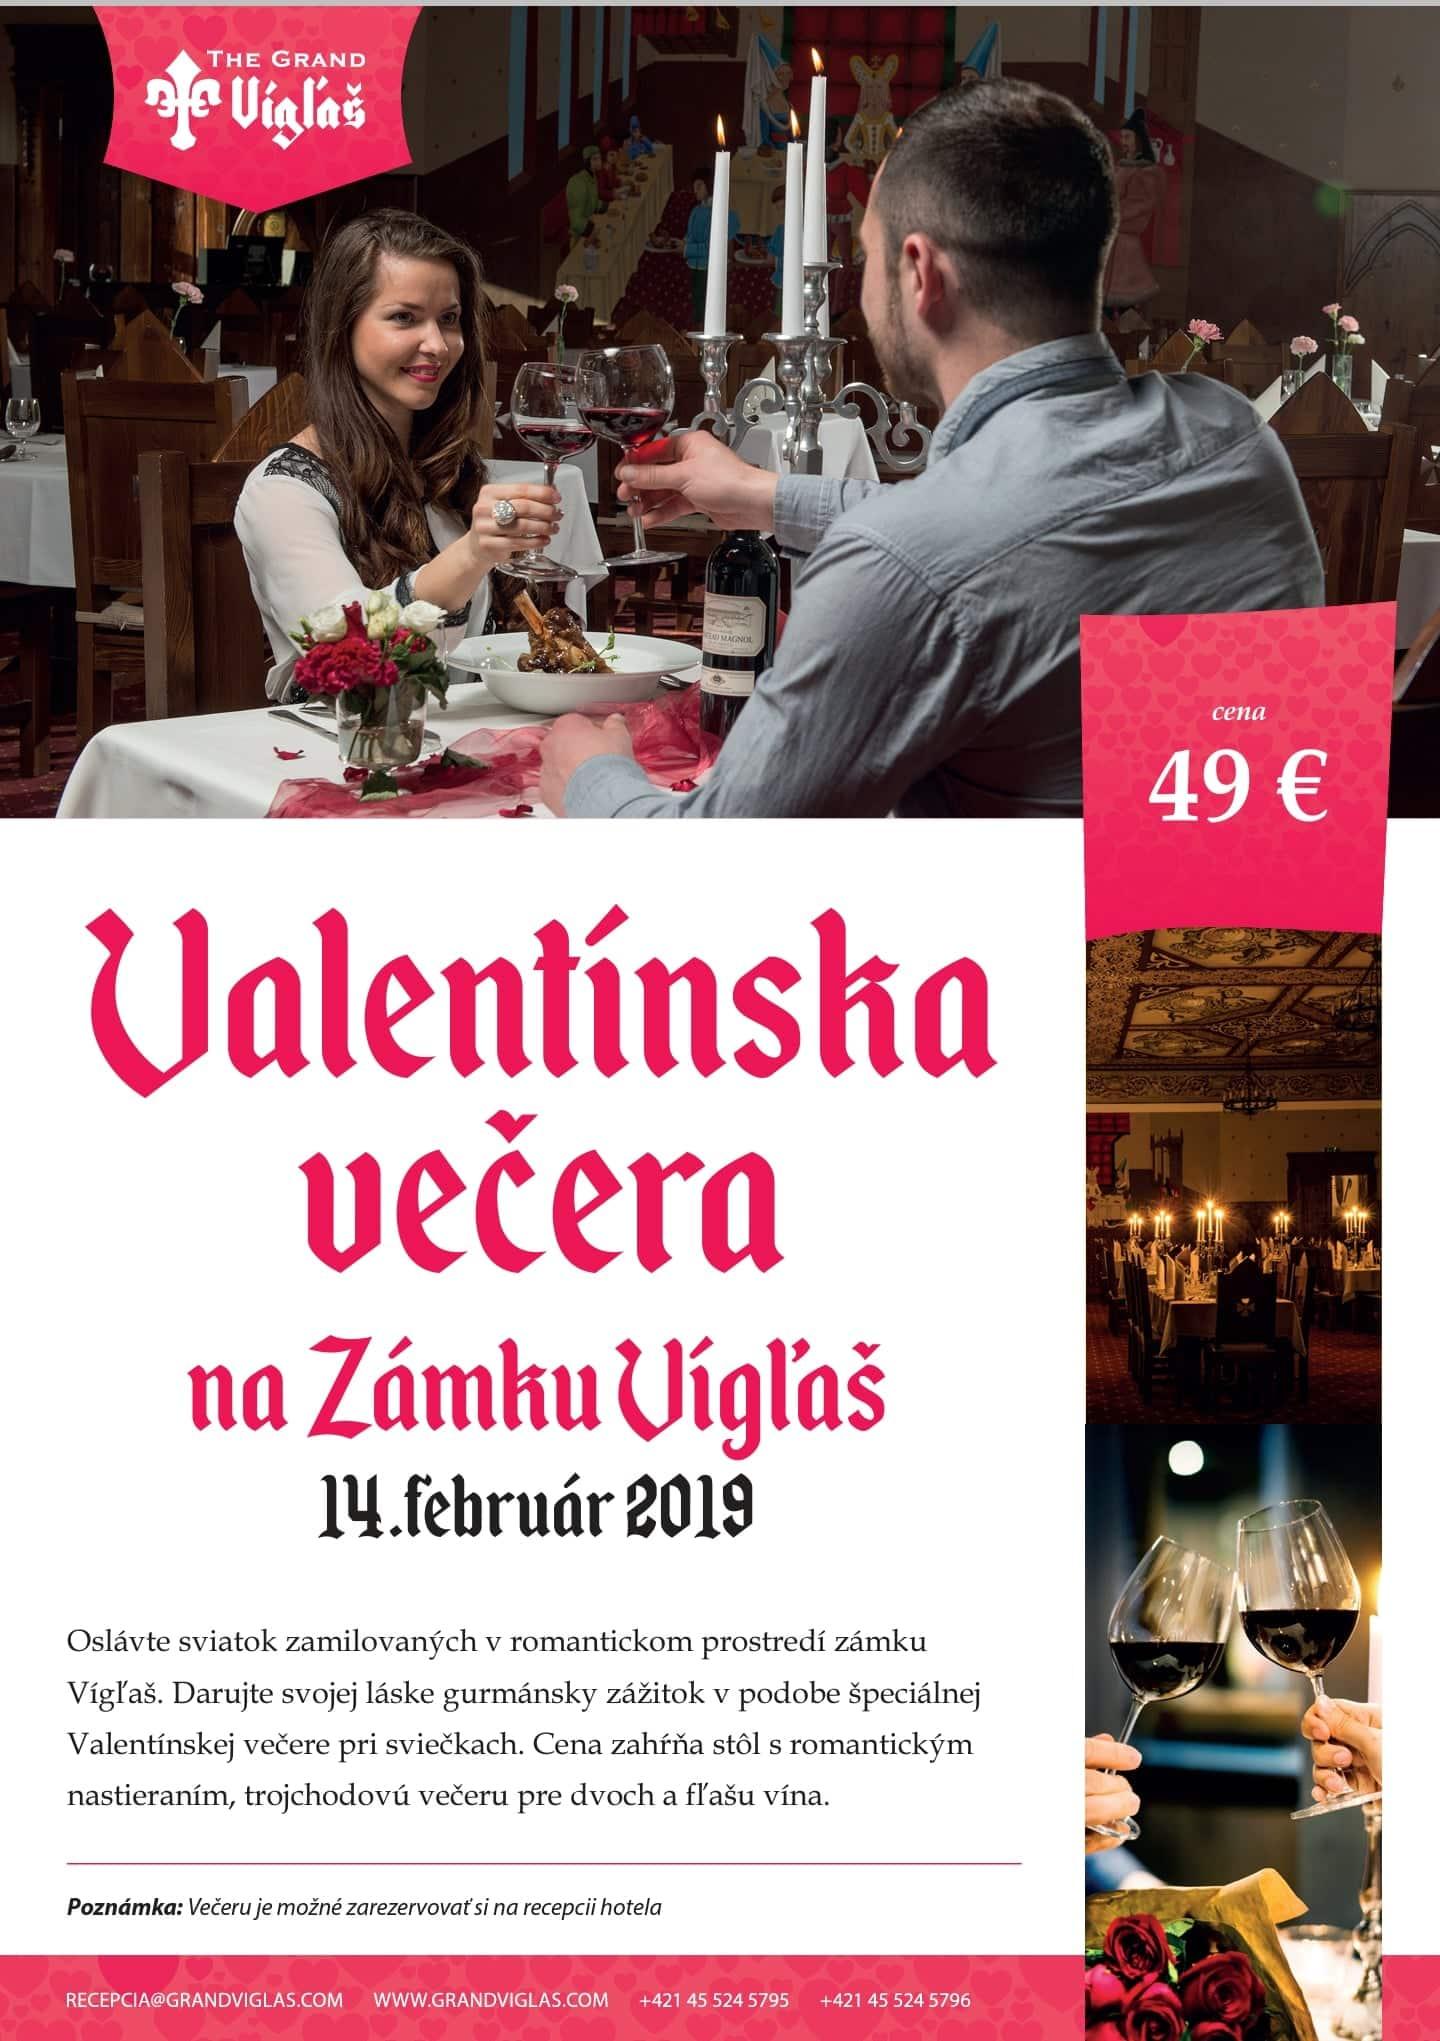 Valentínska večera 14.02.2019